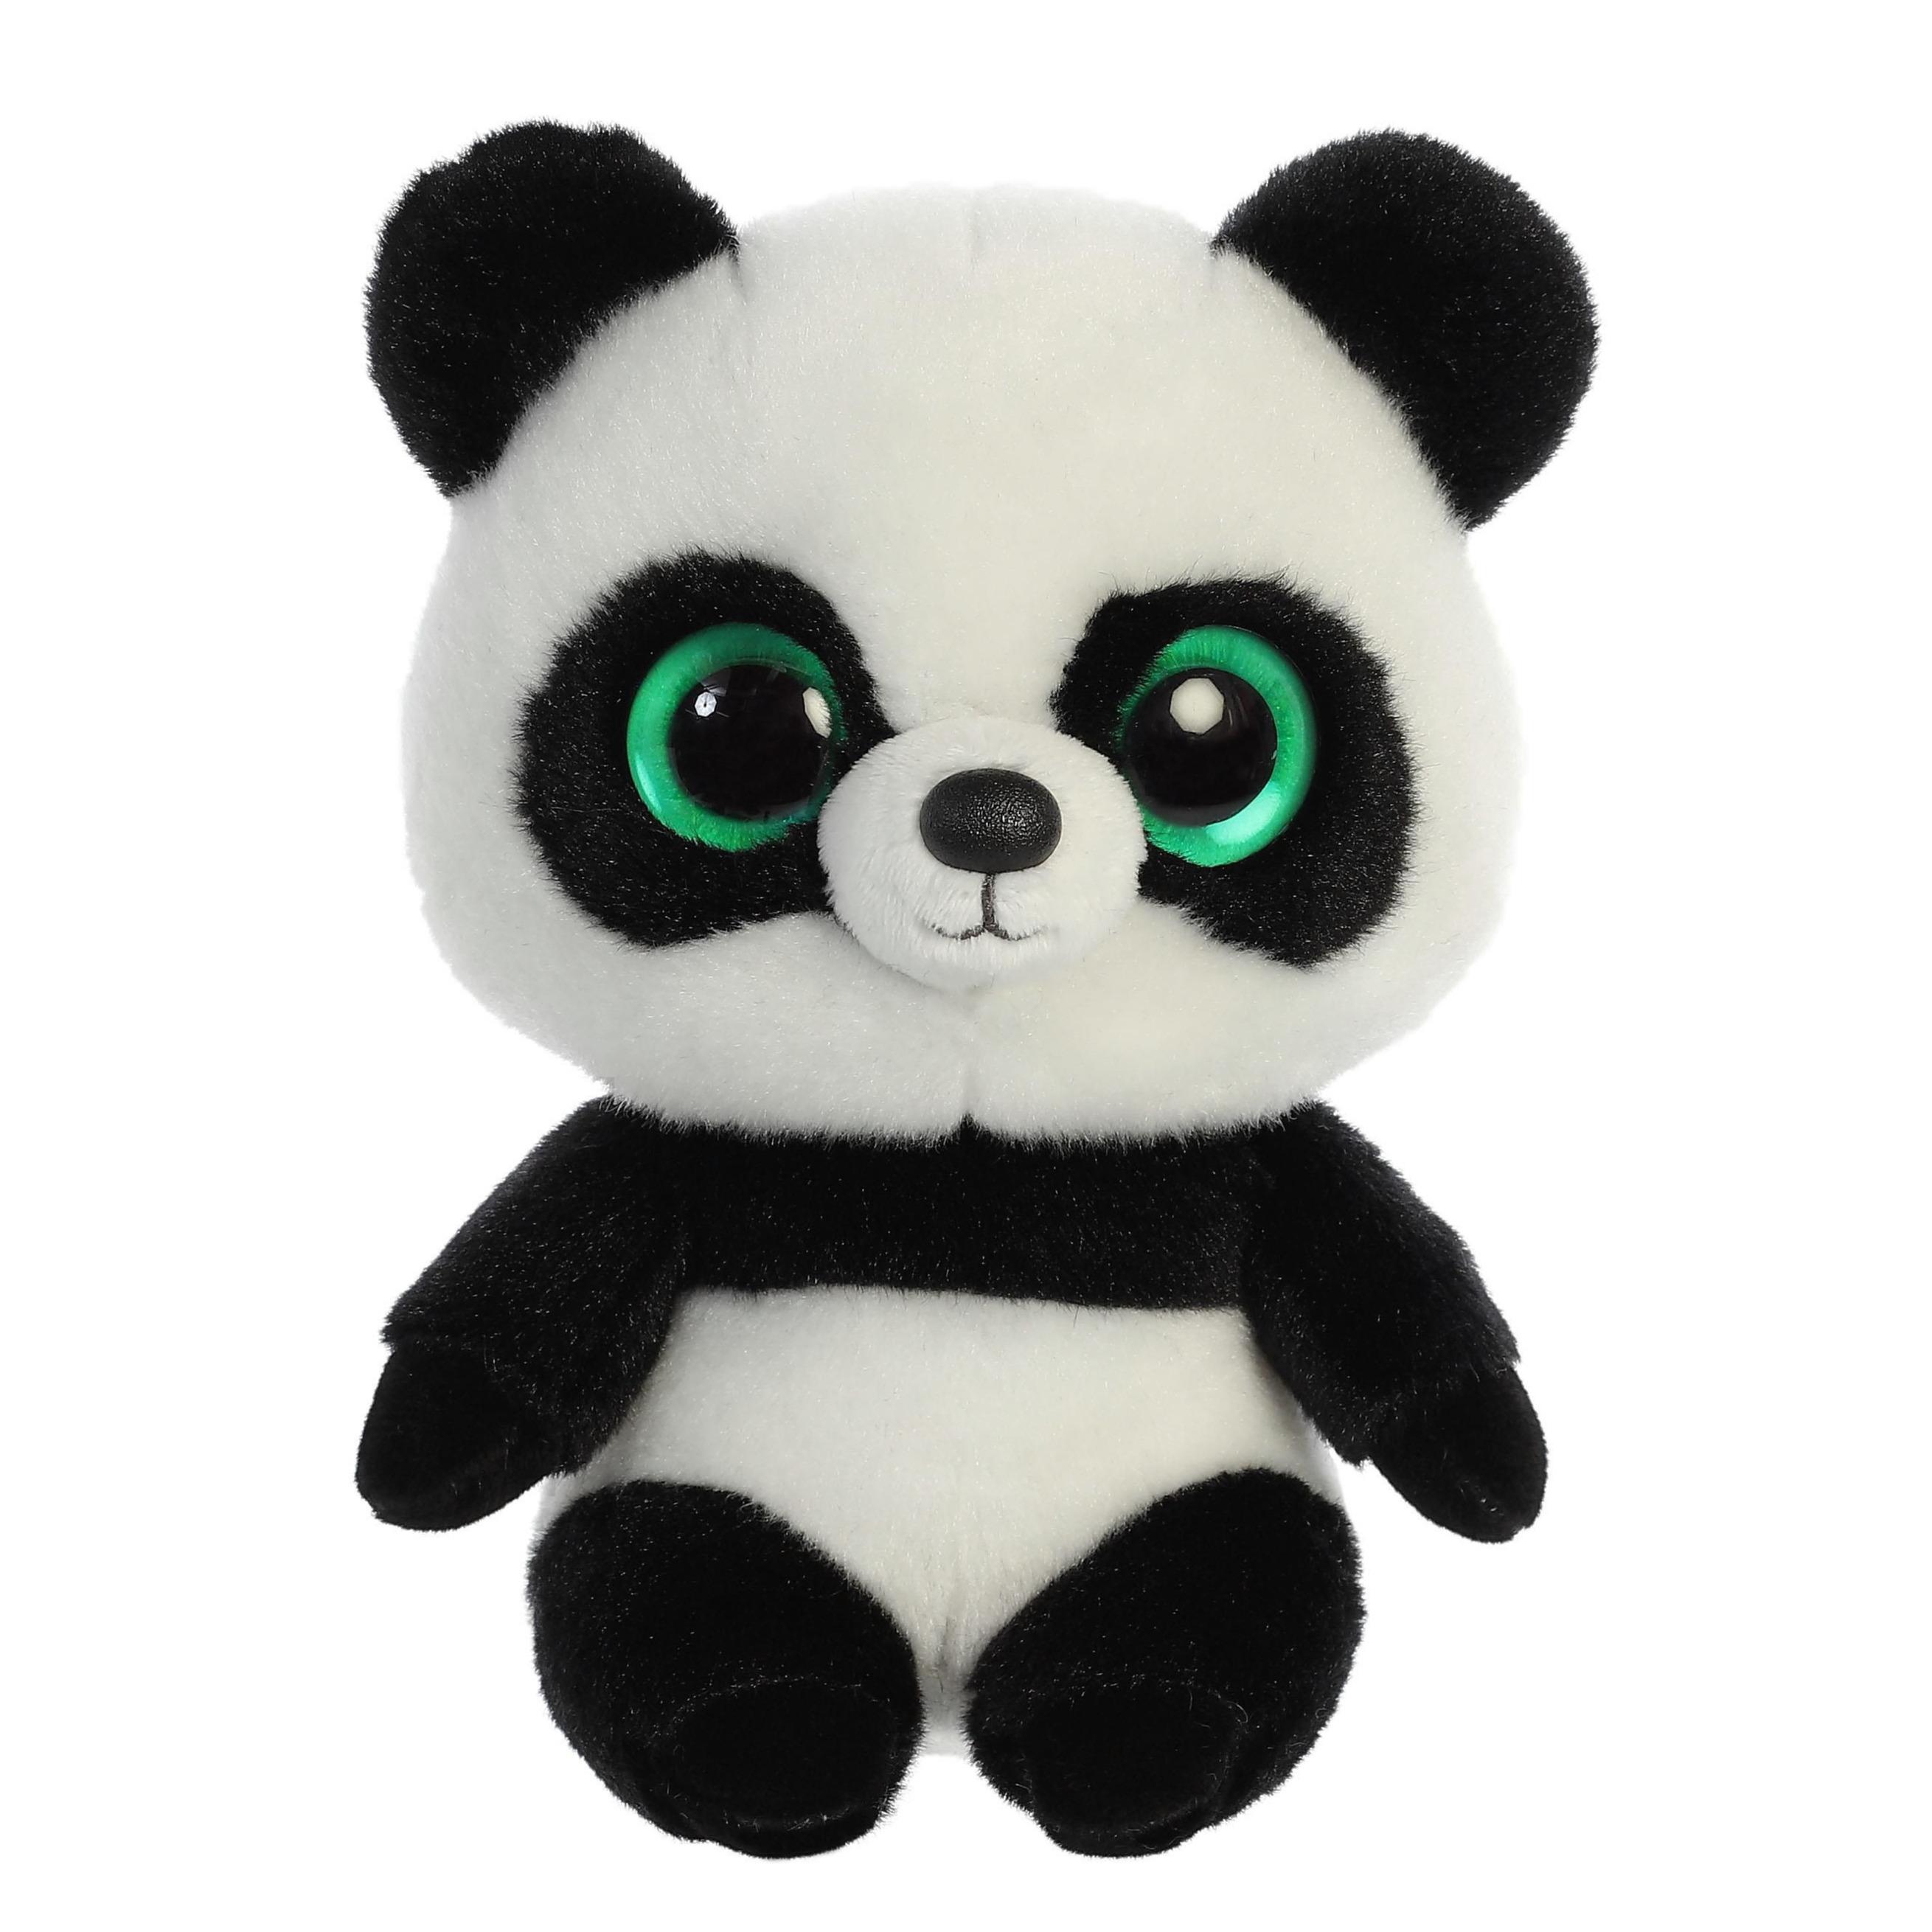 Pluche panda beer knuffel 20 cm